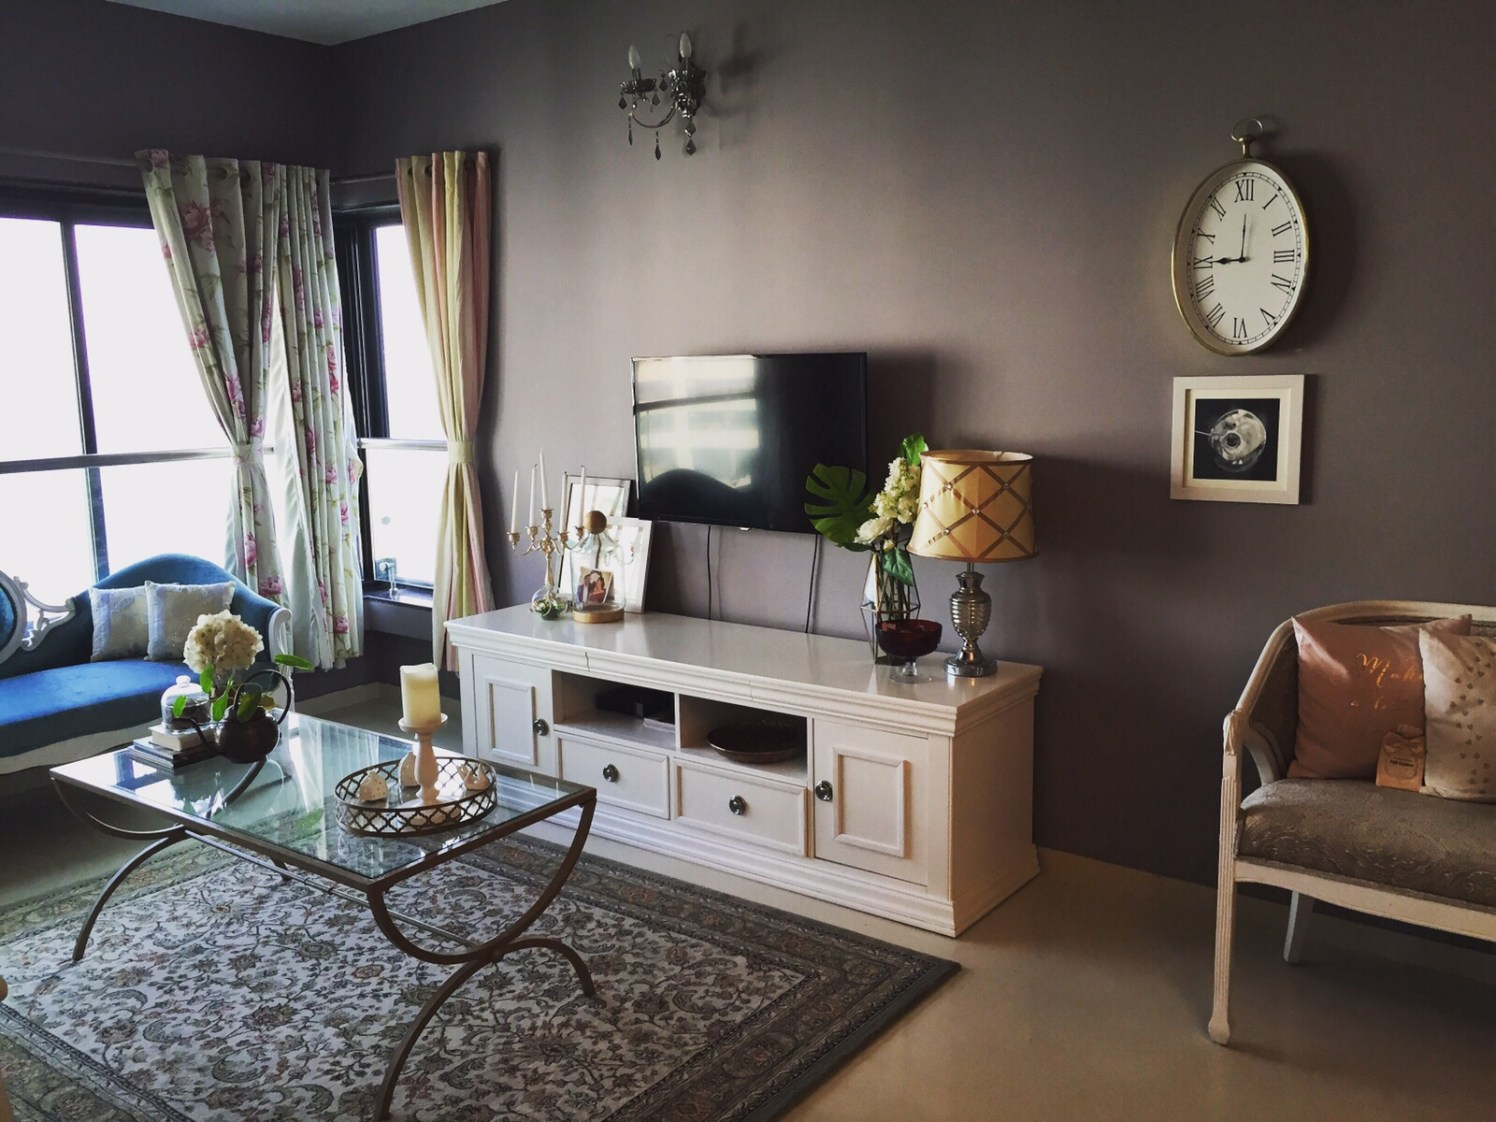 Bole Brown Shaded Vintage Living Room by Khyaati Verma Living-room Vintage | Interior Design Photos & Ideas